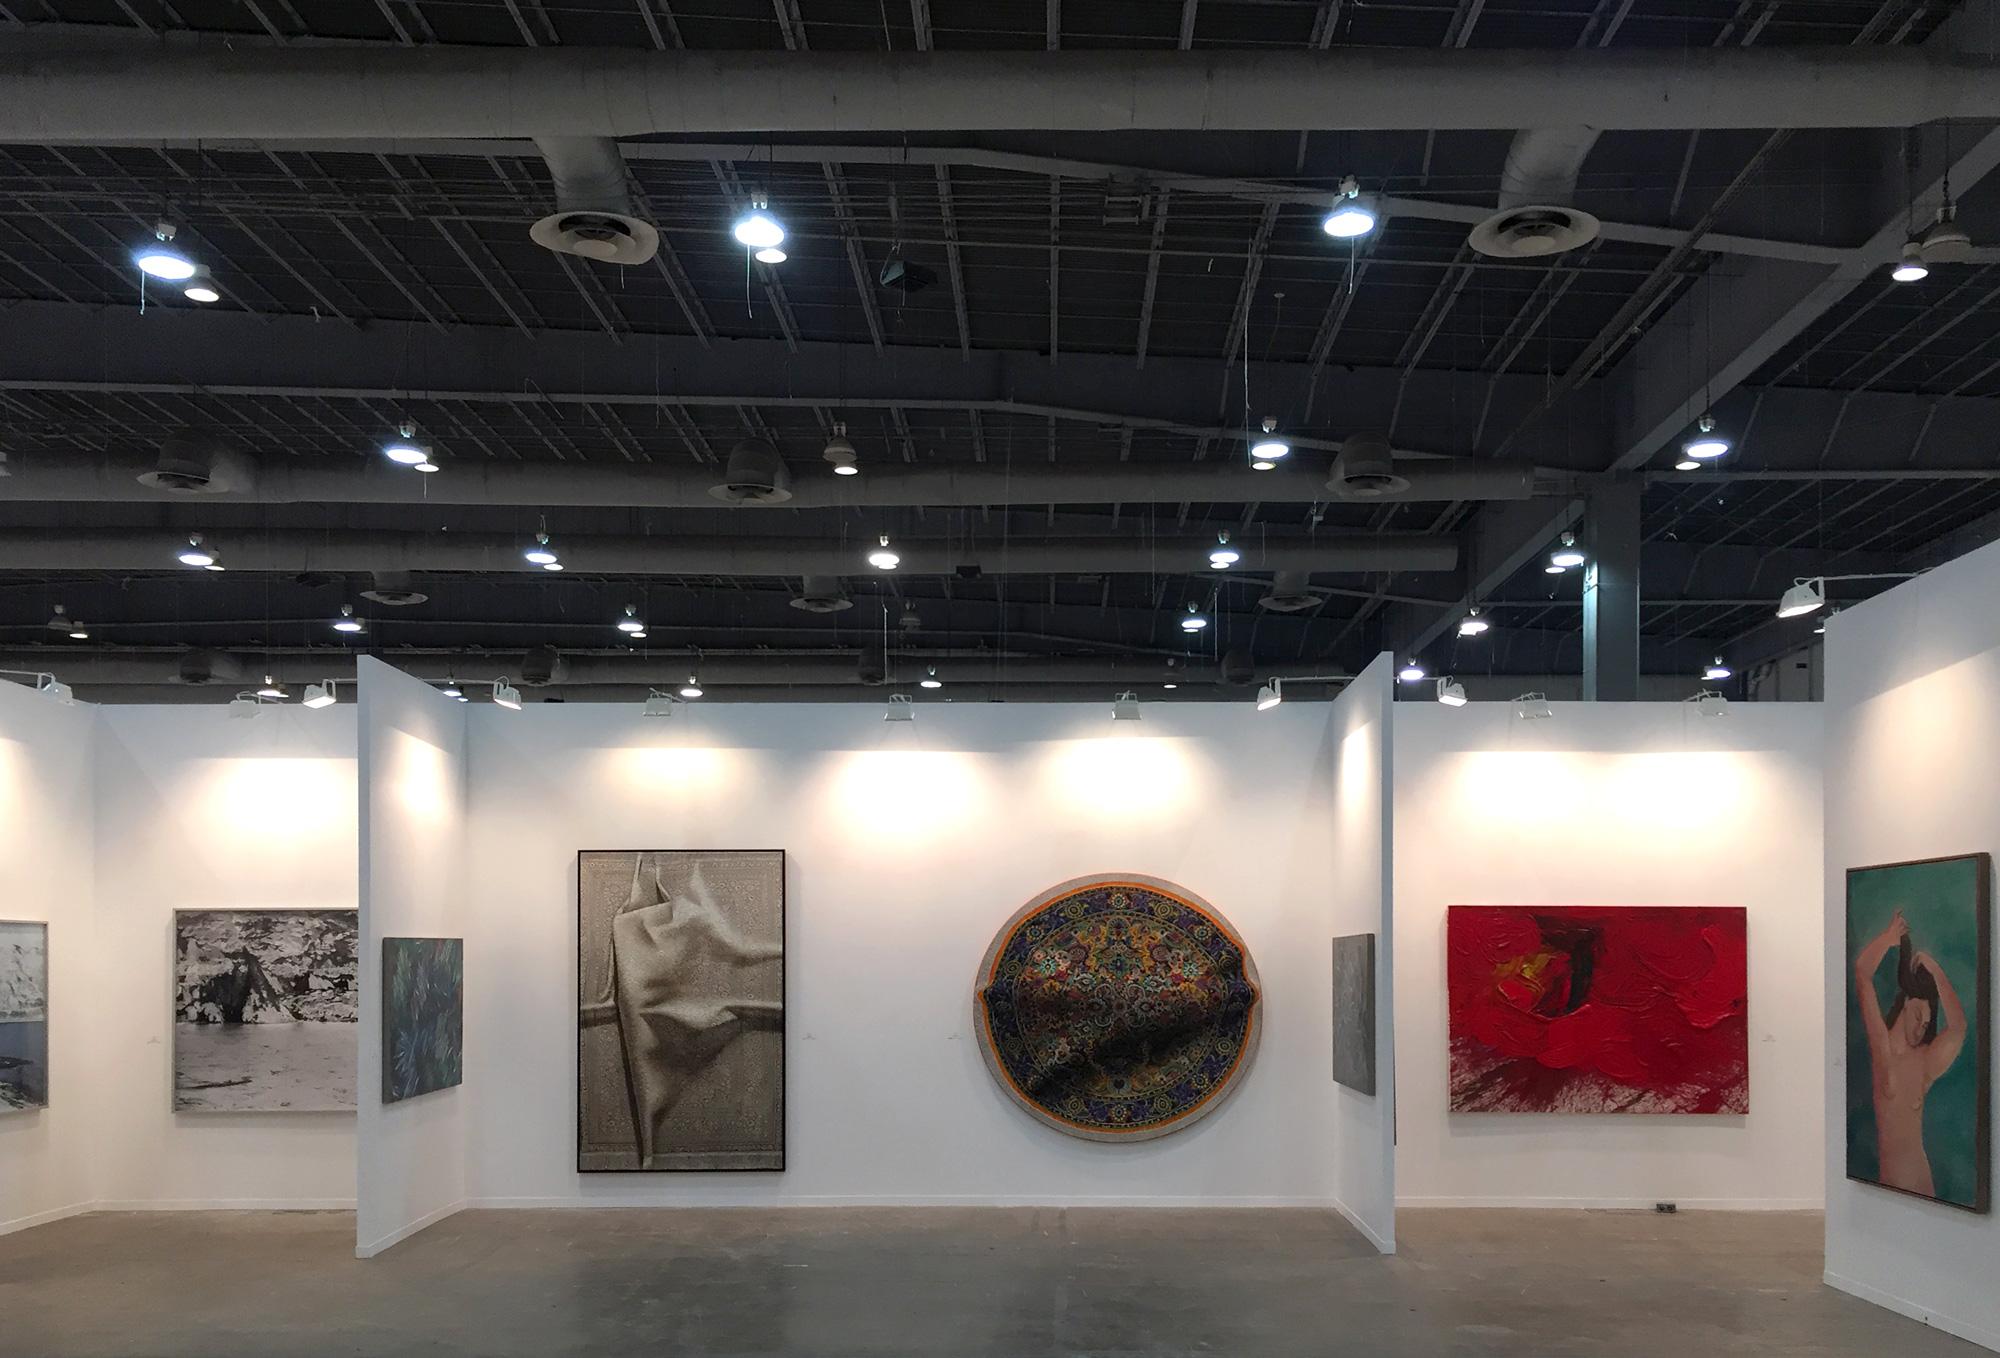 ZONA MACO Mexico City 2018  1970 Marc Straus Gallery